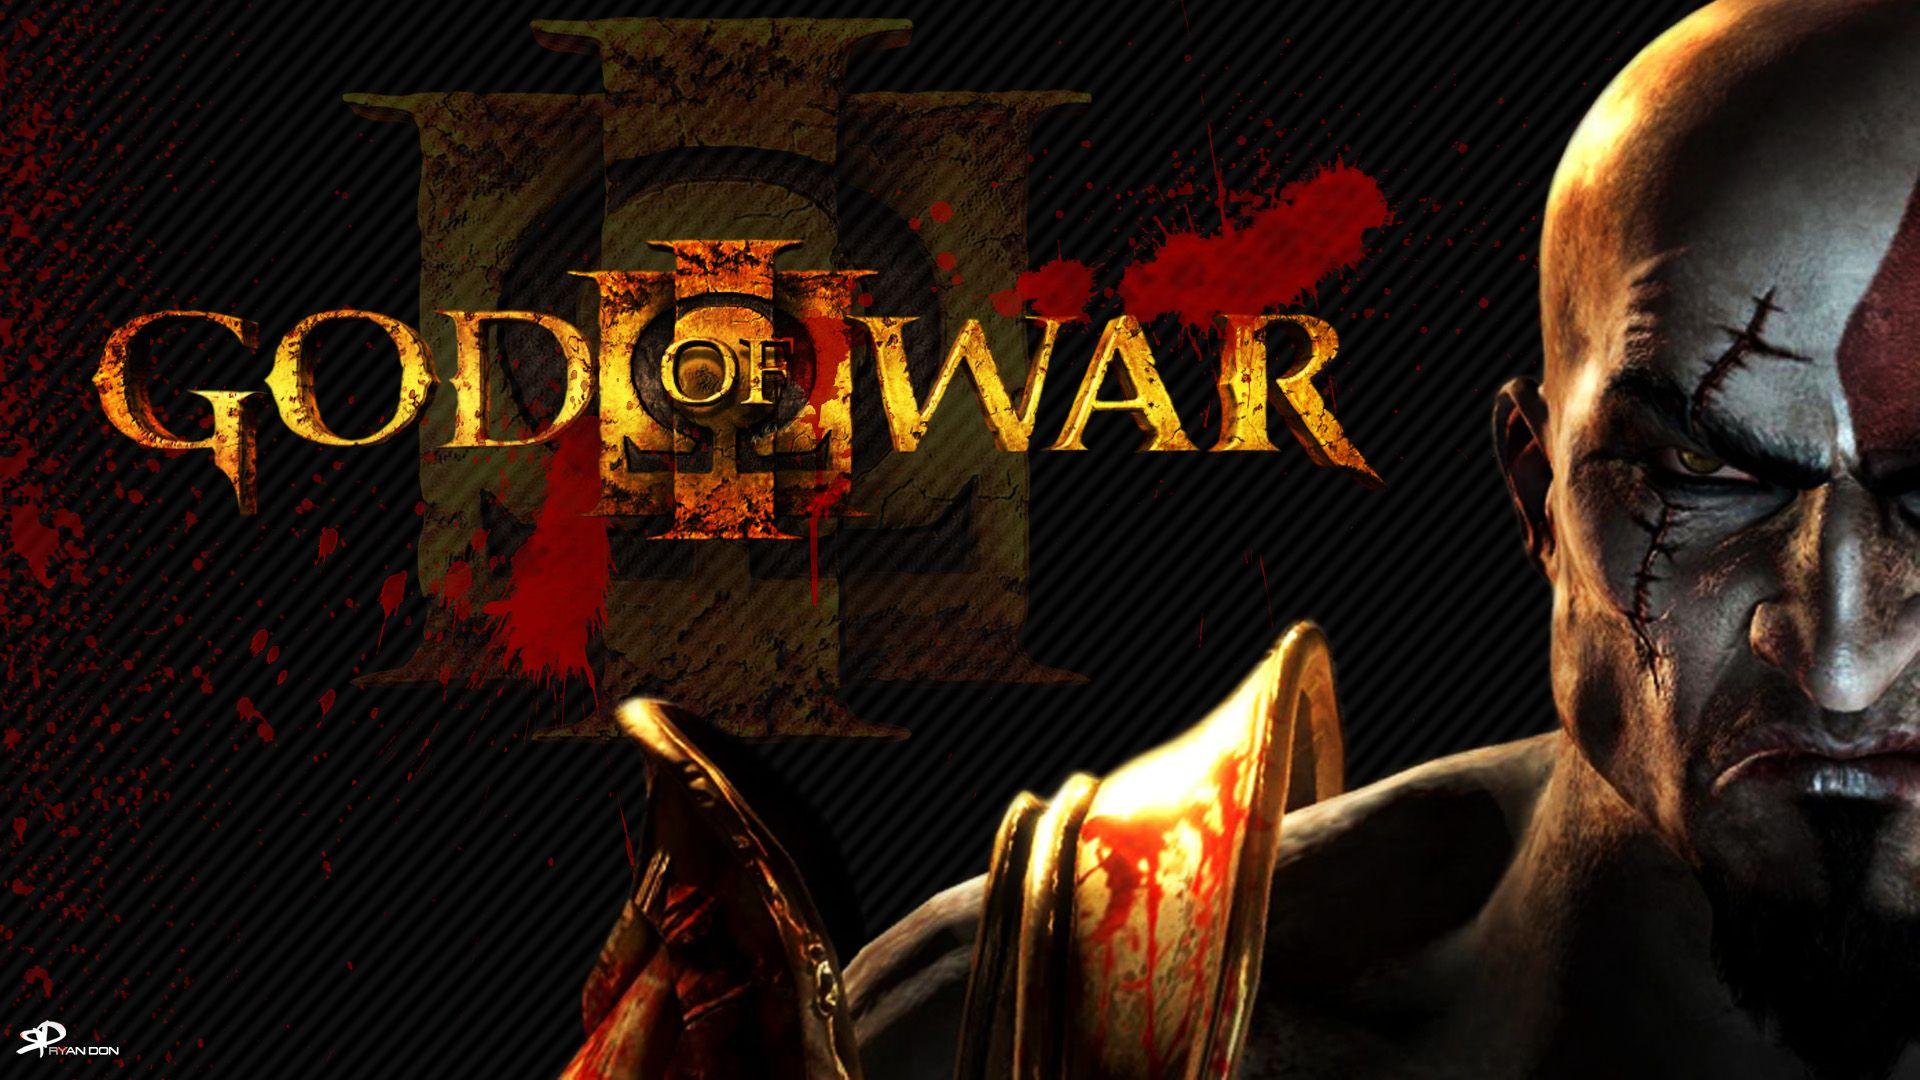 Best Way To Release Your Anger Kratos God Of War God Of War 3 Wallpapers God Of War